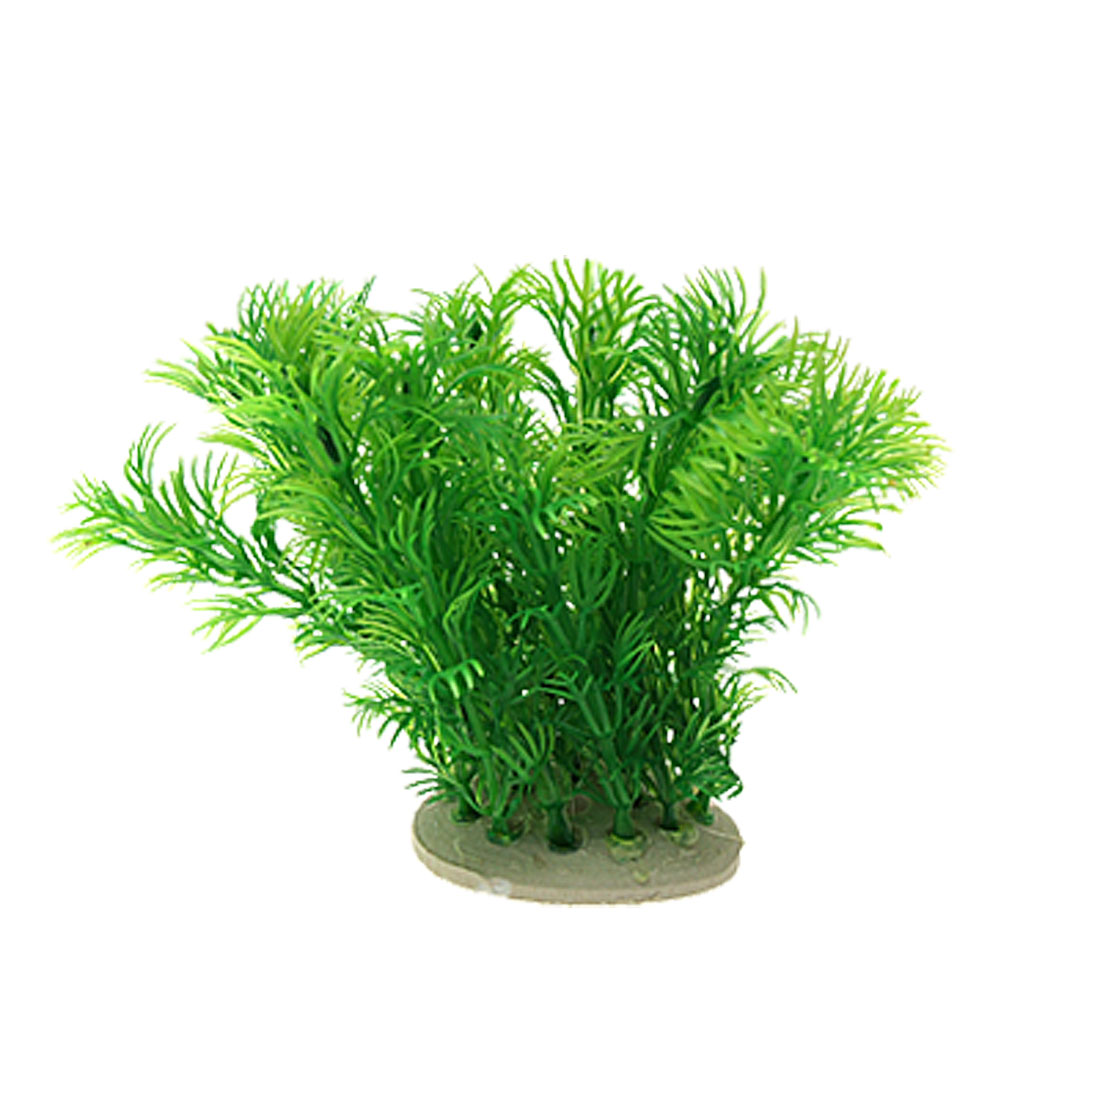 Realistic Green Plastic Plants Decor Ornament for Fish Tank